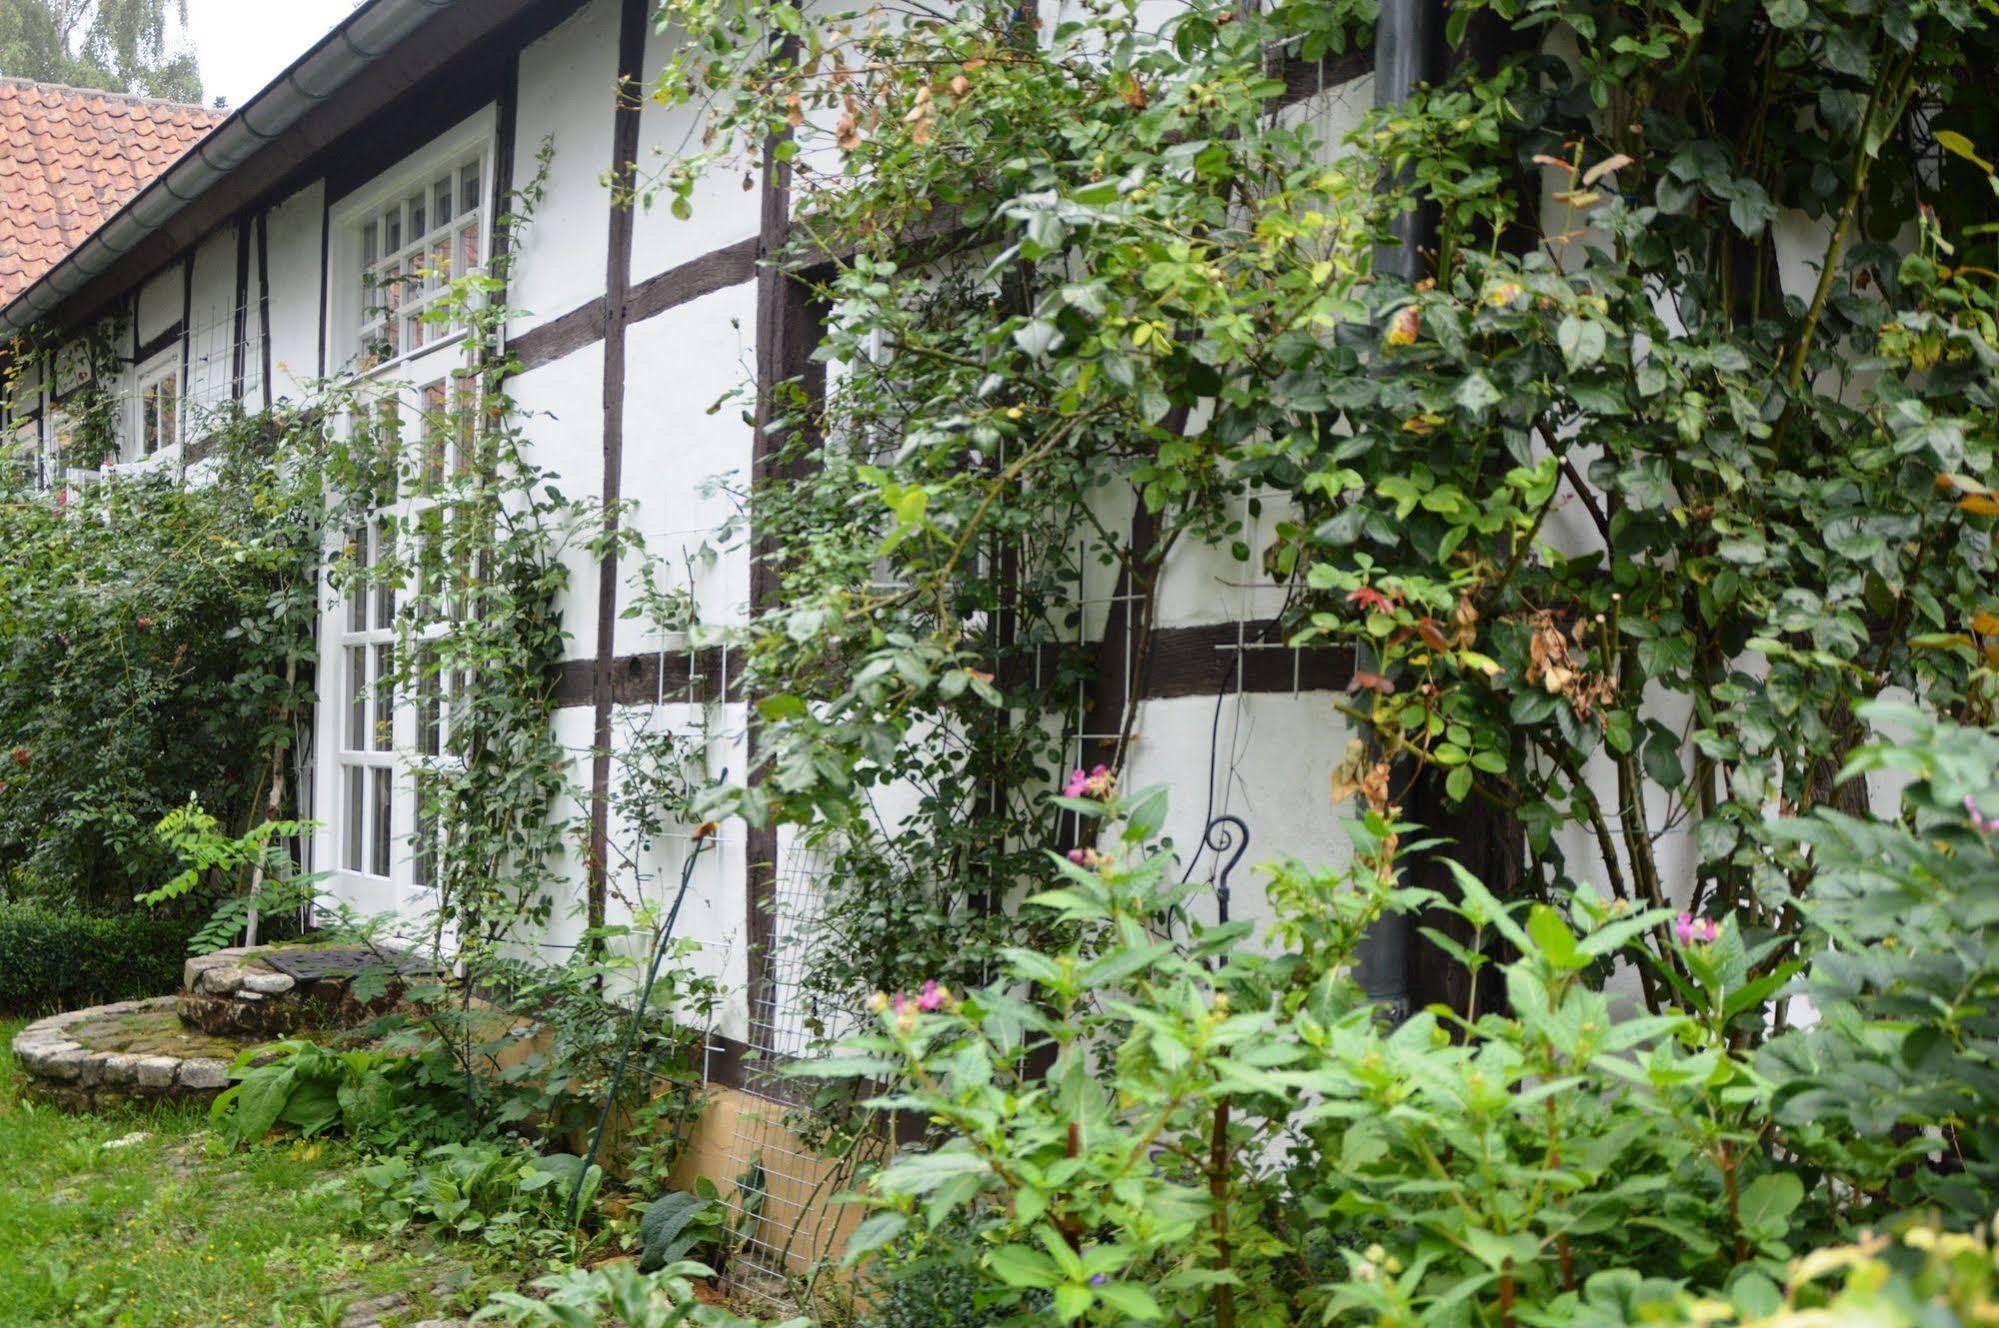 B and B Rosindell Cottage